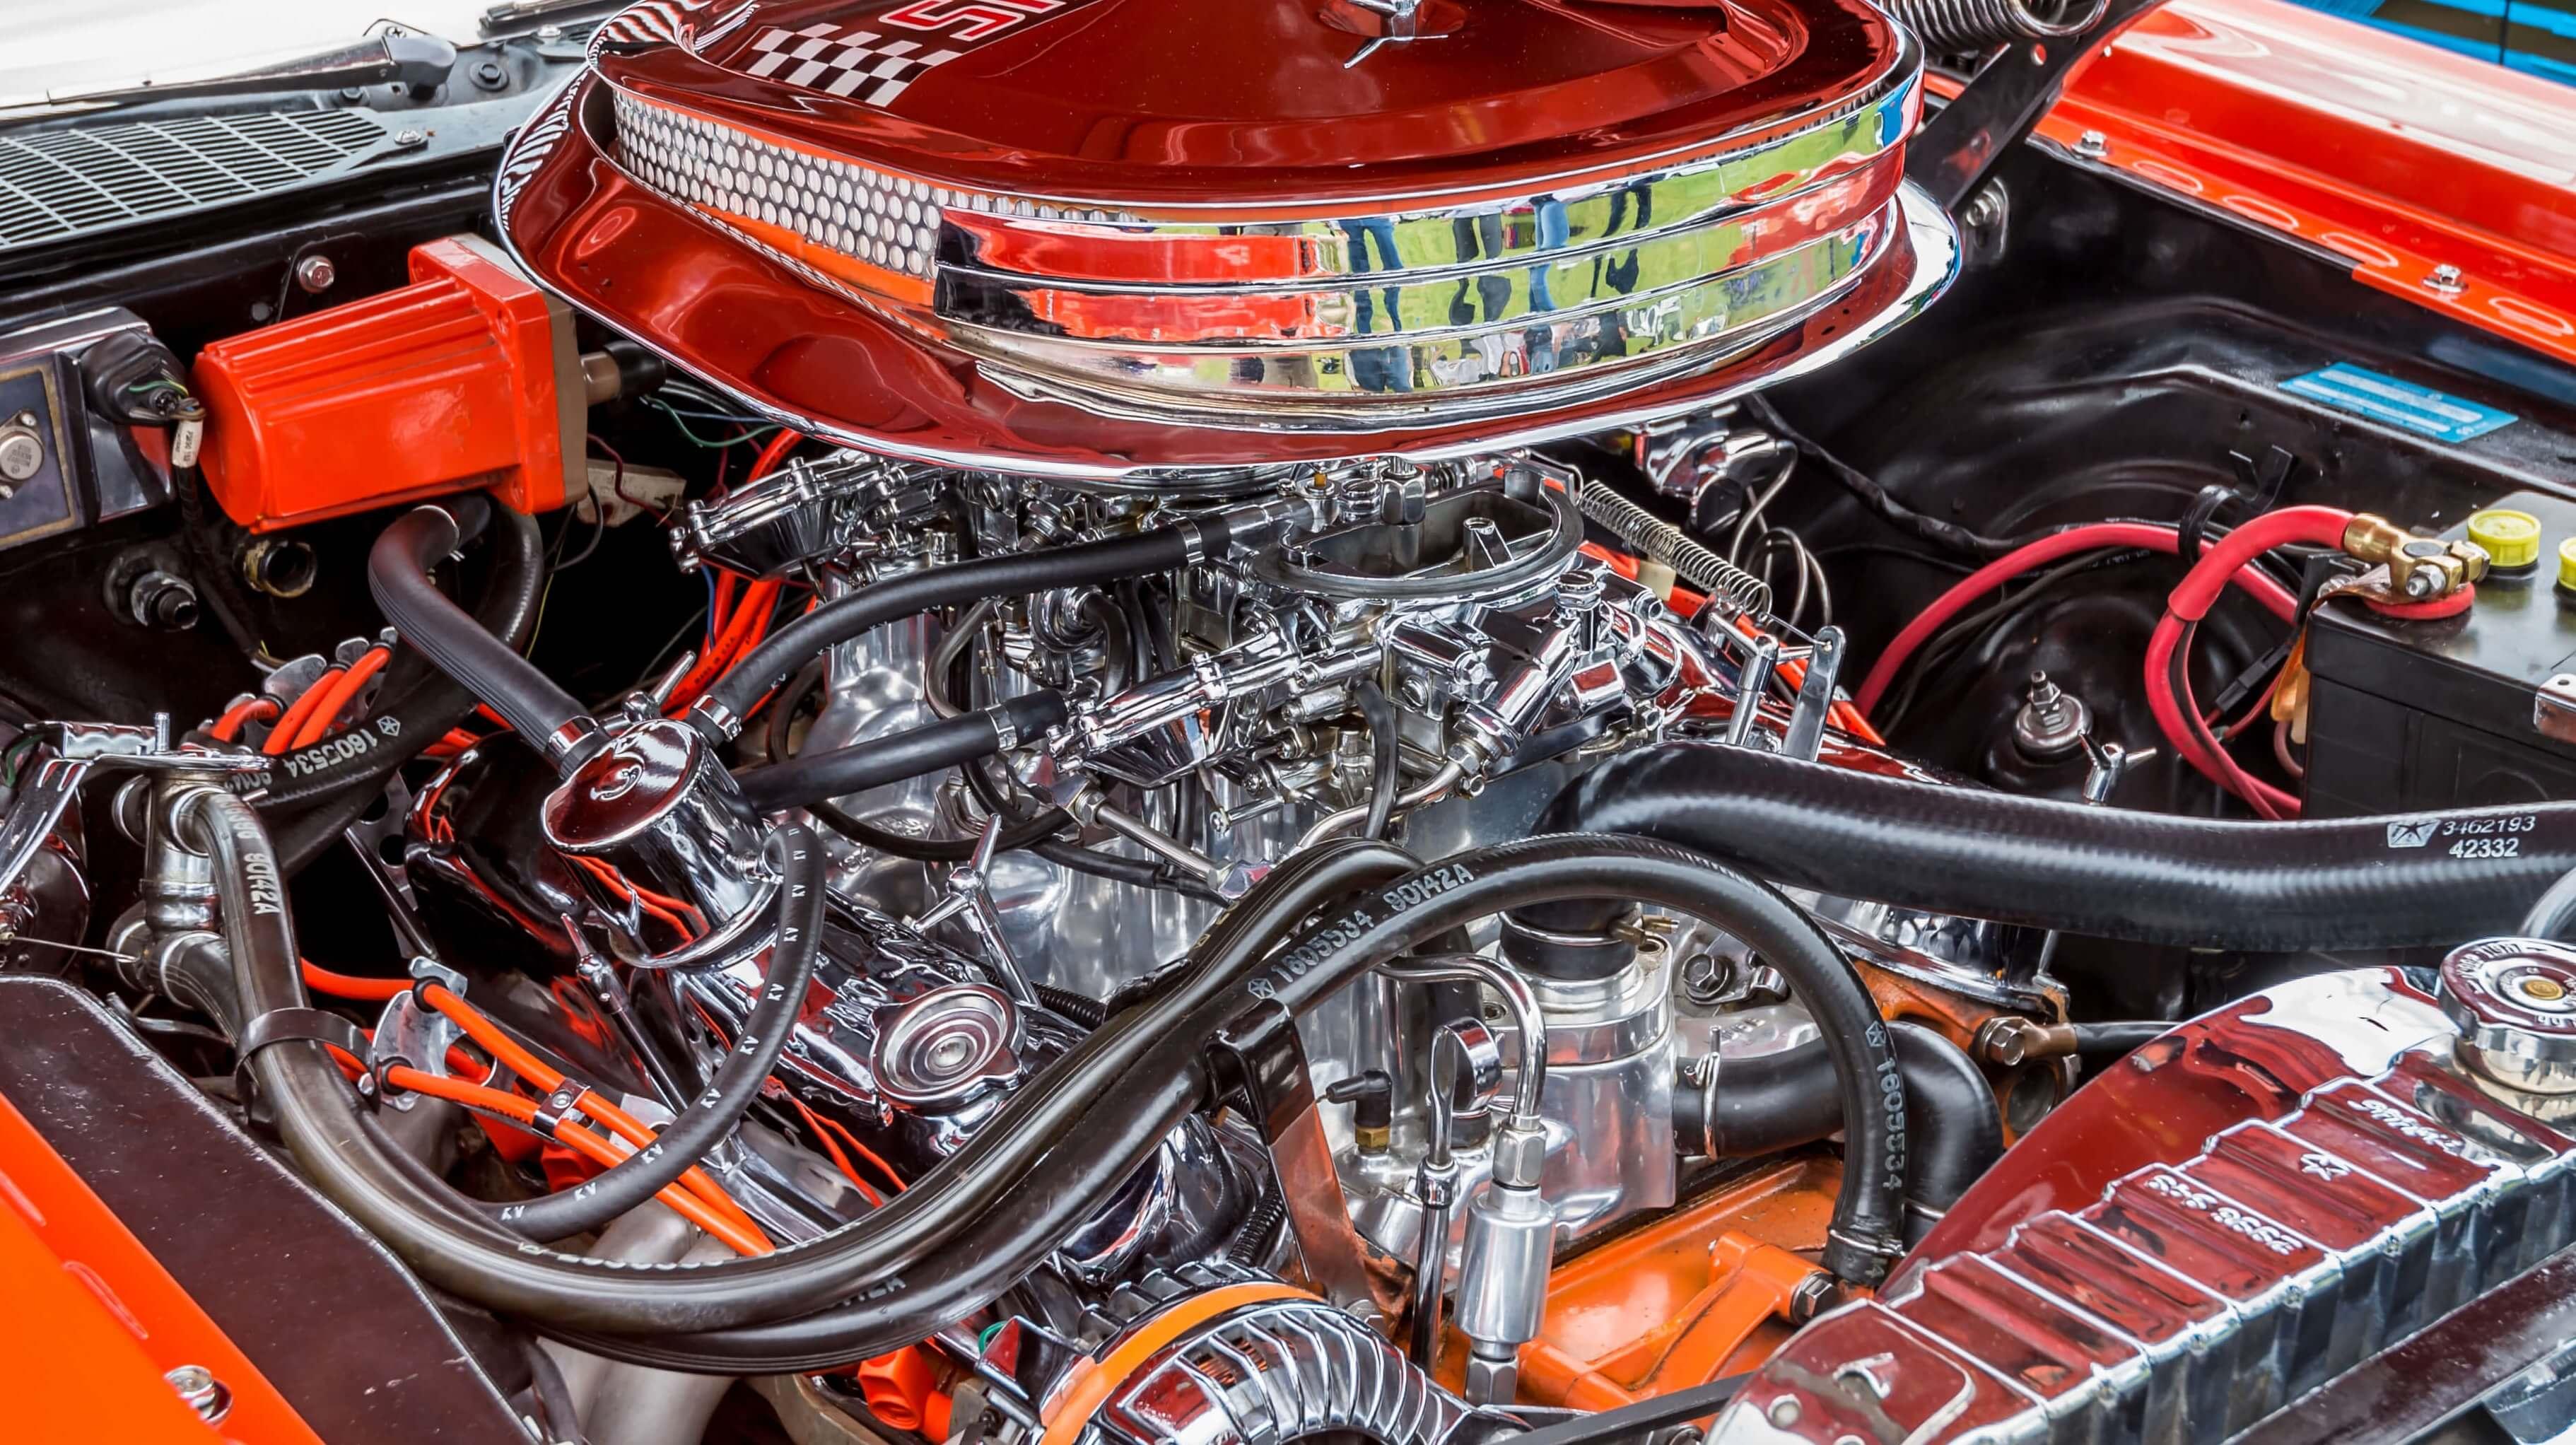 steve's 1970 Dodge Challenger - Holley My Garage